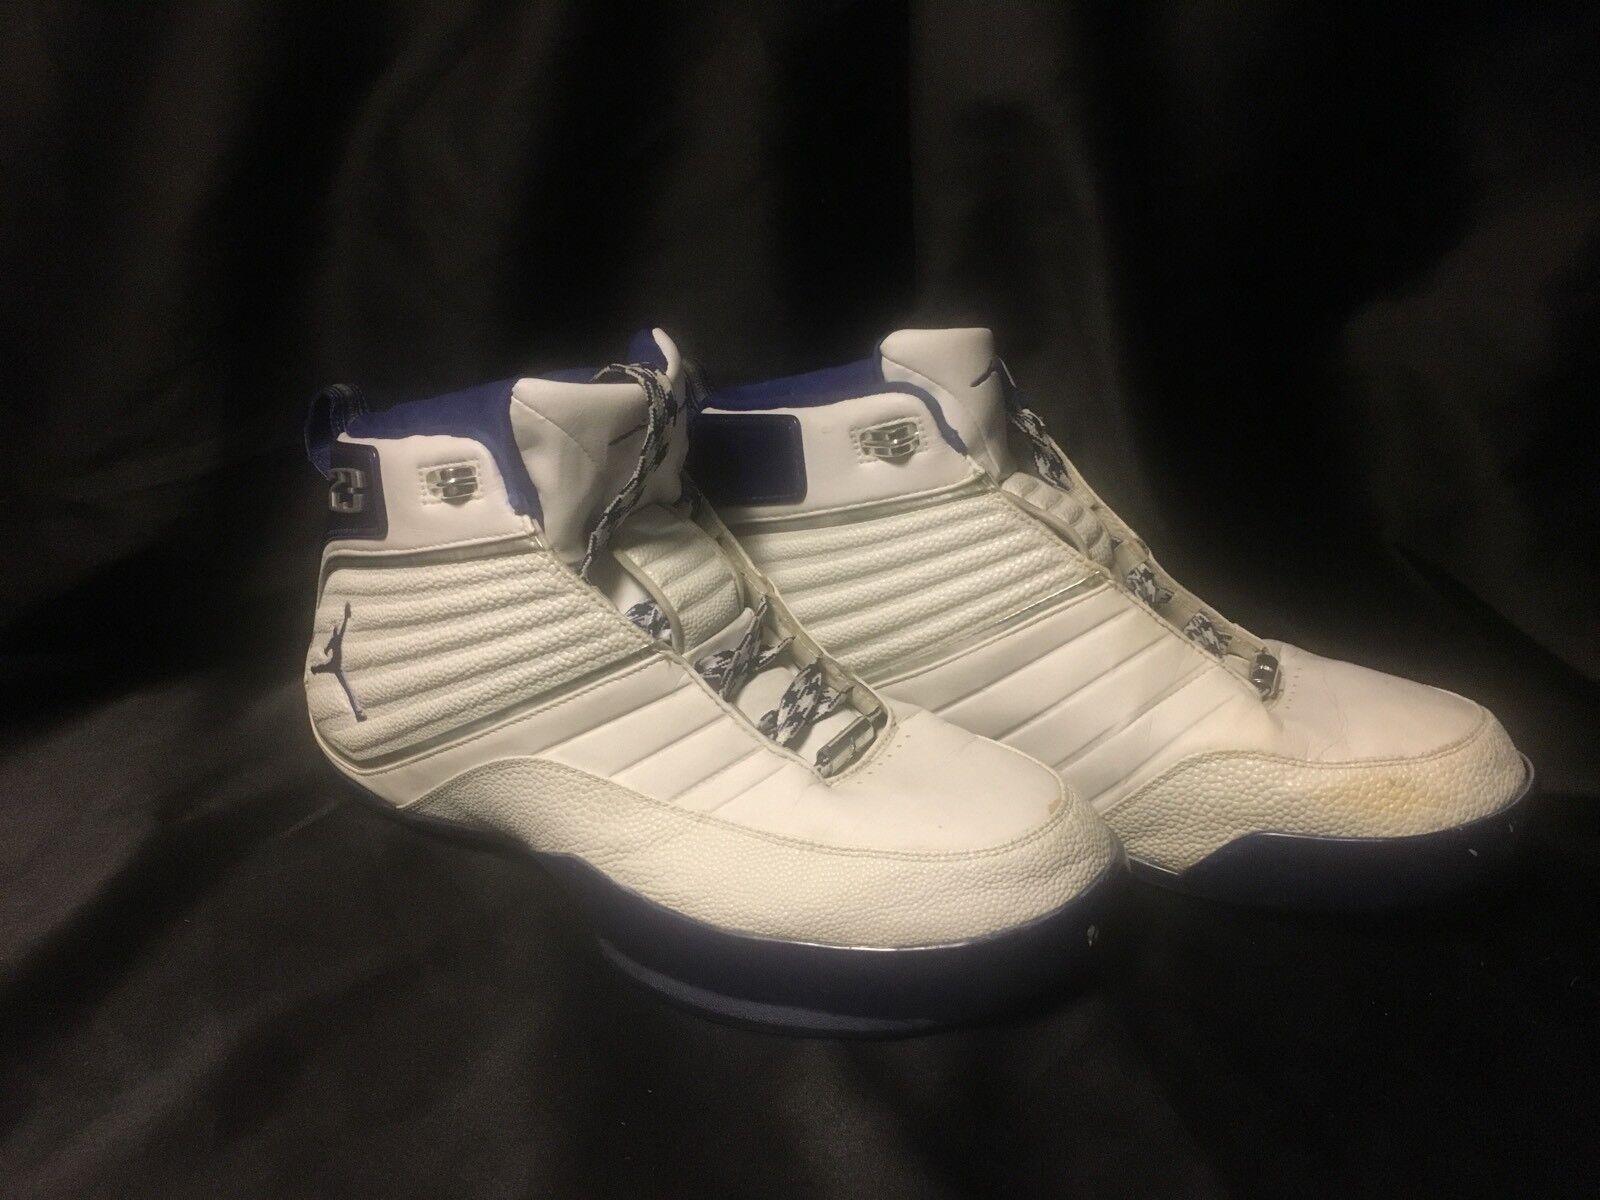 innovative design d5816 a6712 ... Nike Nike Nike Air Jordan Jumpman ProStatus - 2004 SZ13 bd00ec ...